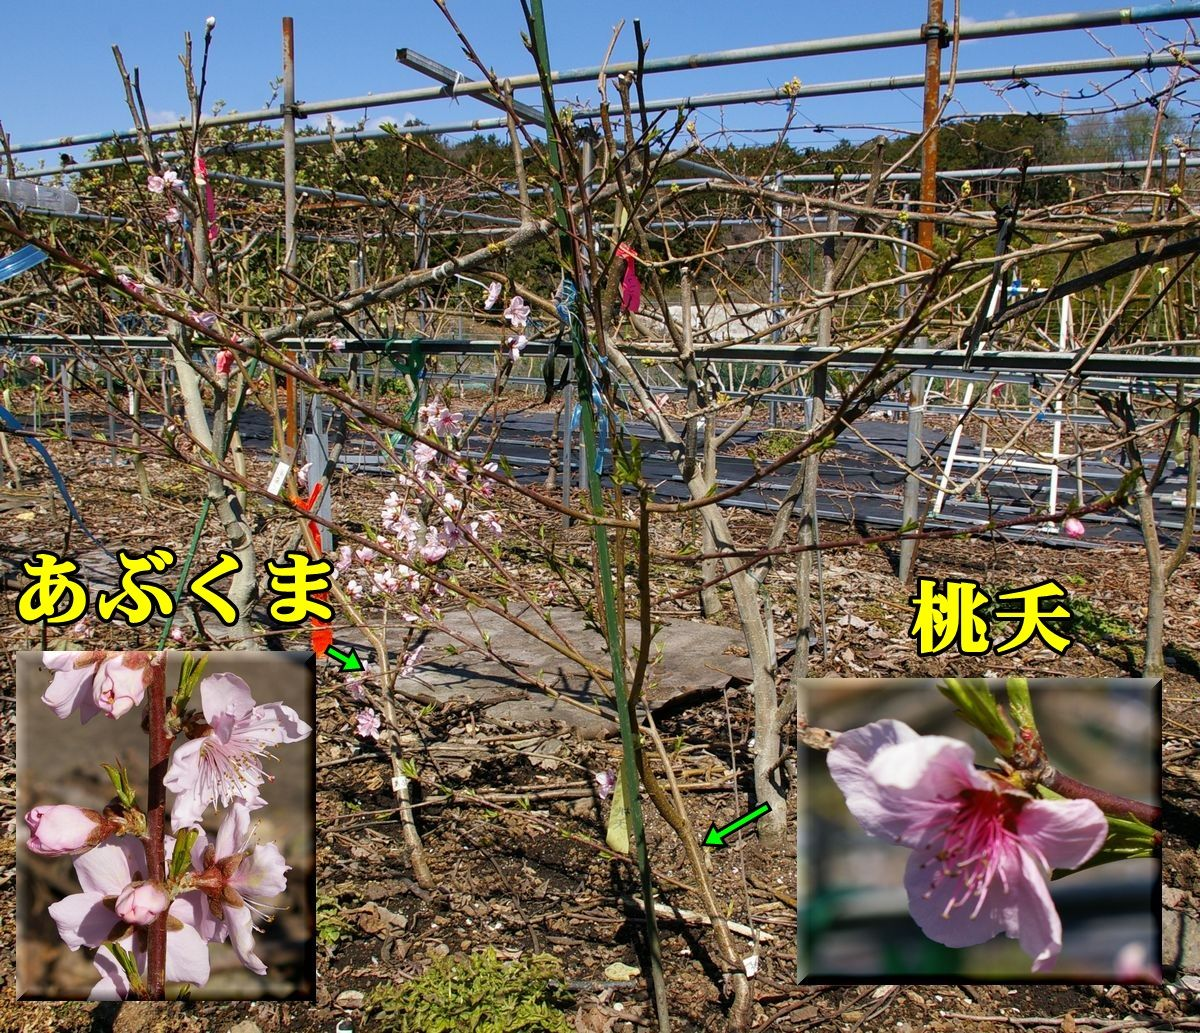 2M_toyo_abukuma150324_029.jpg